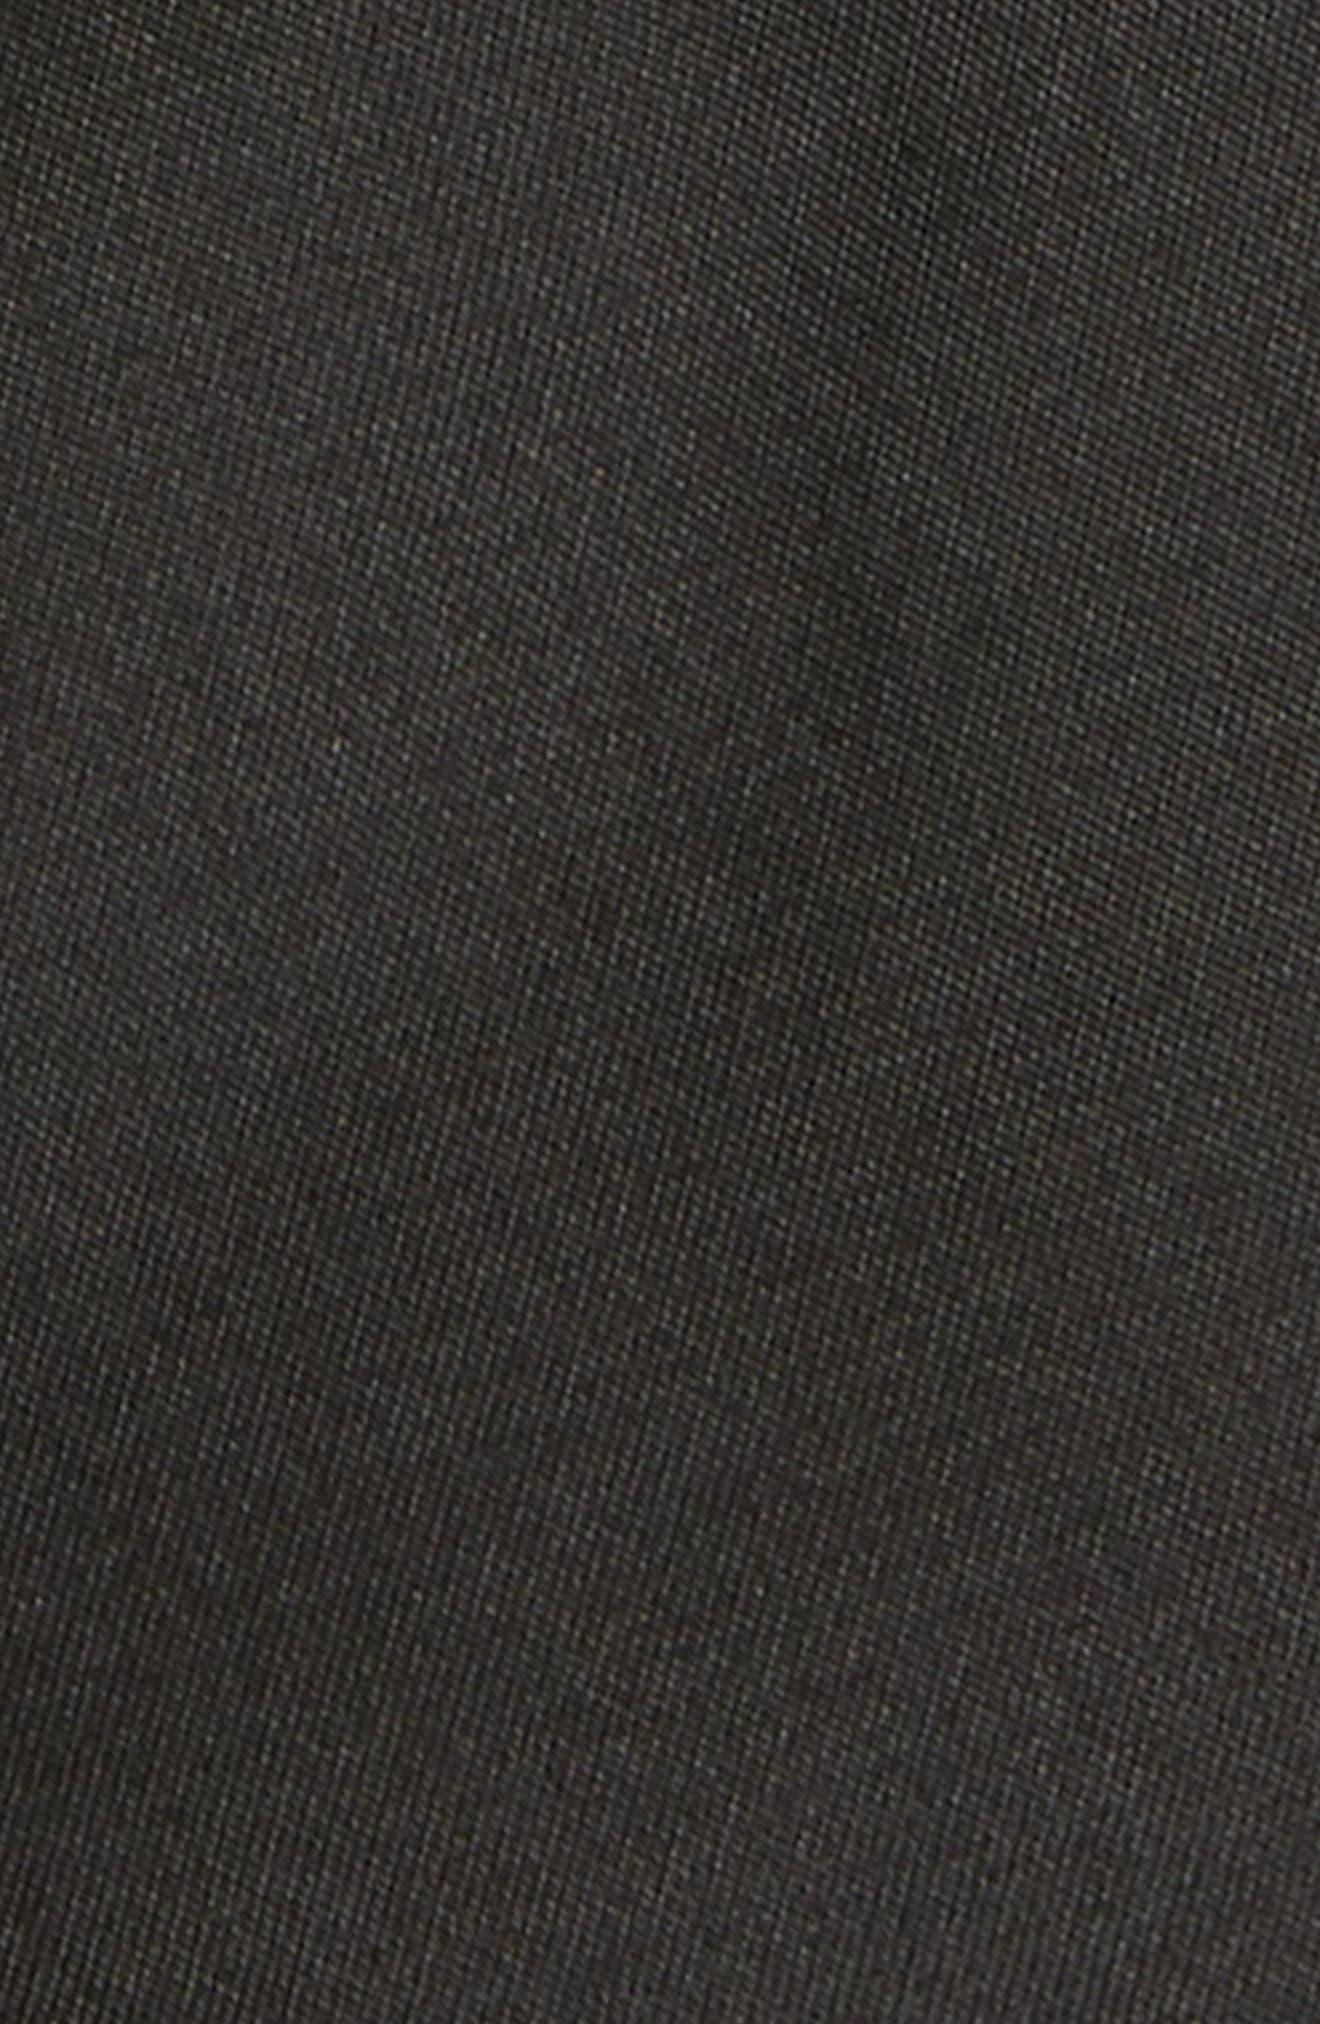 MICHAEL KORS,                             Solid Matte Silk Tie,                             Alternate thumbnail 2, color,                             BLACK